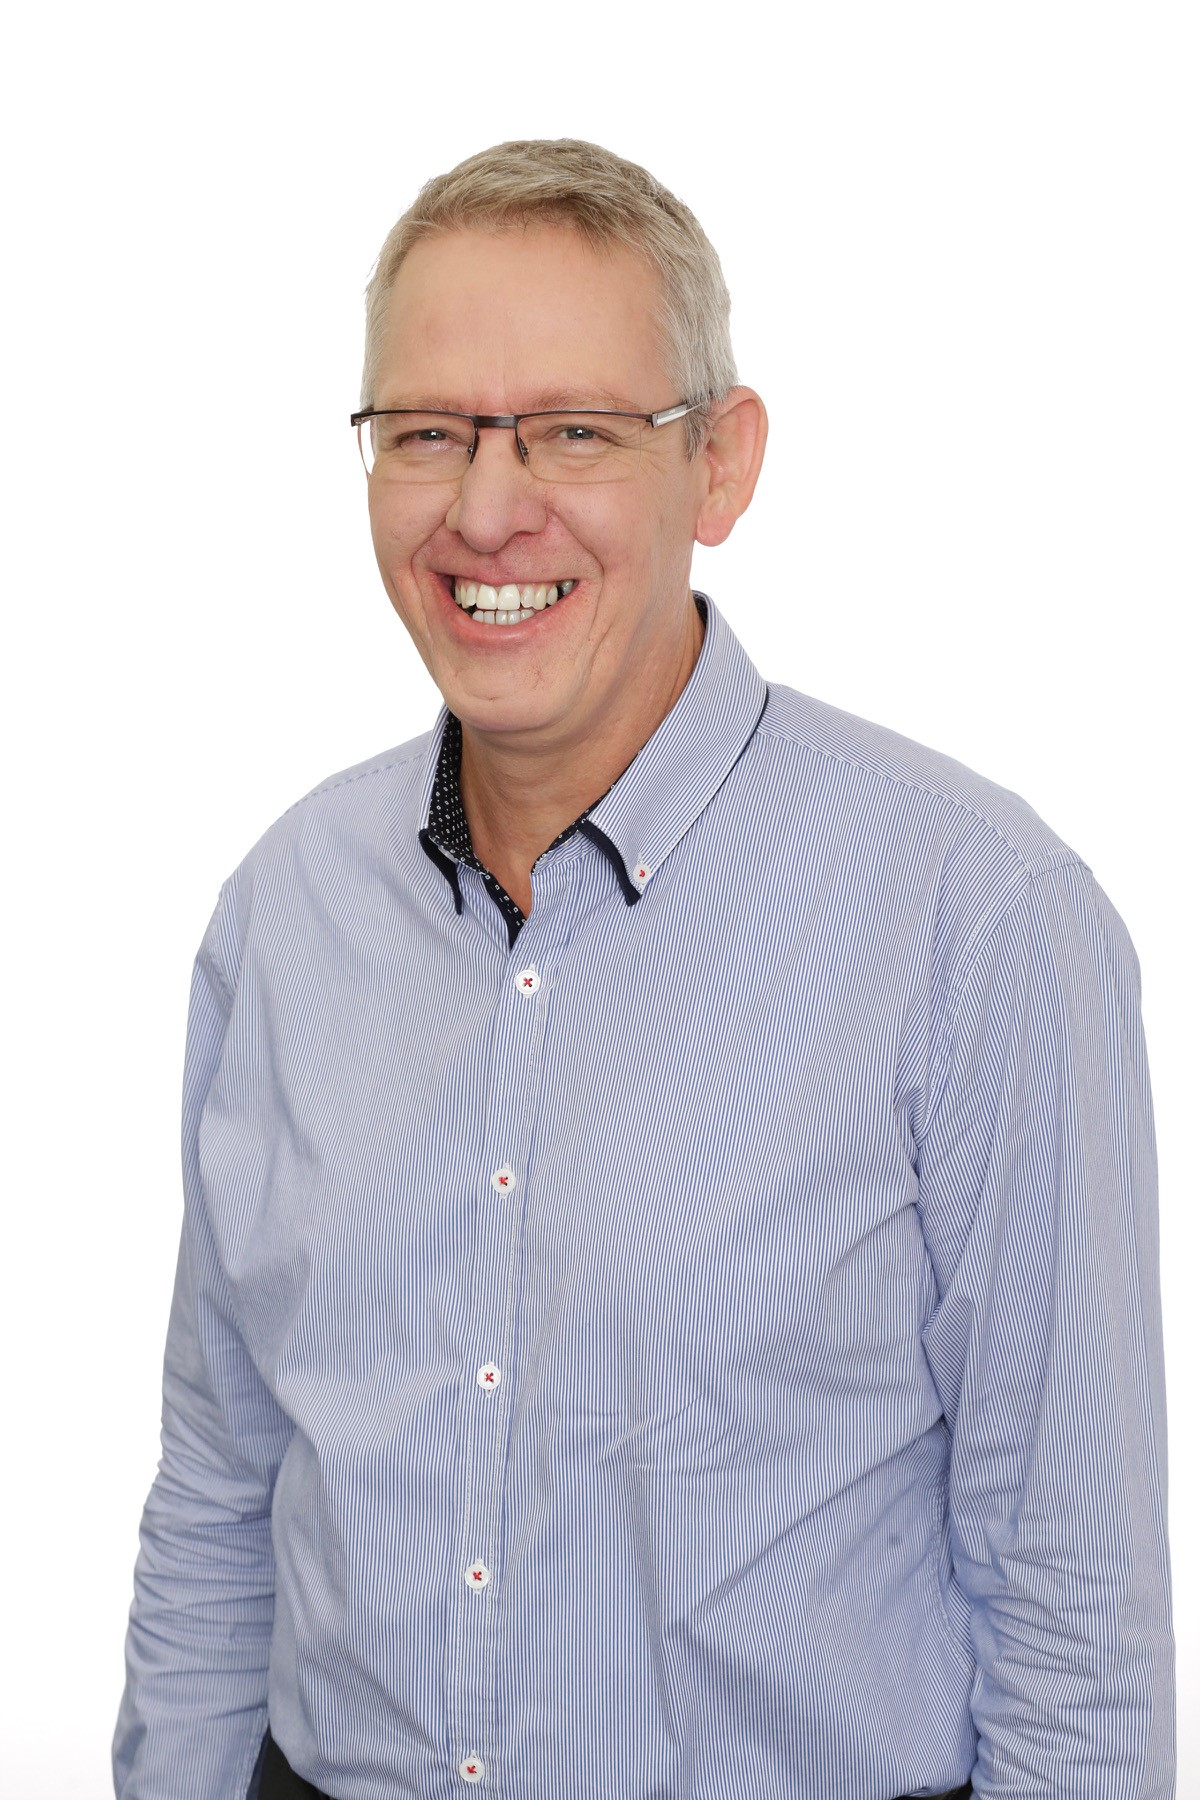 Roy Layfield